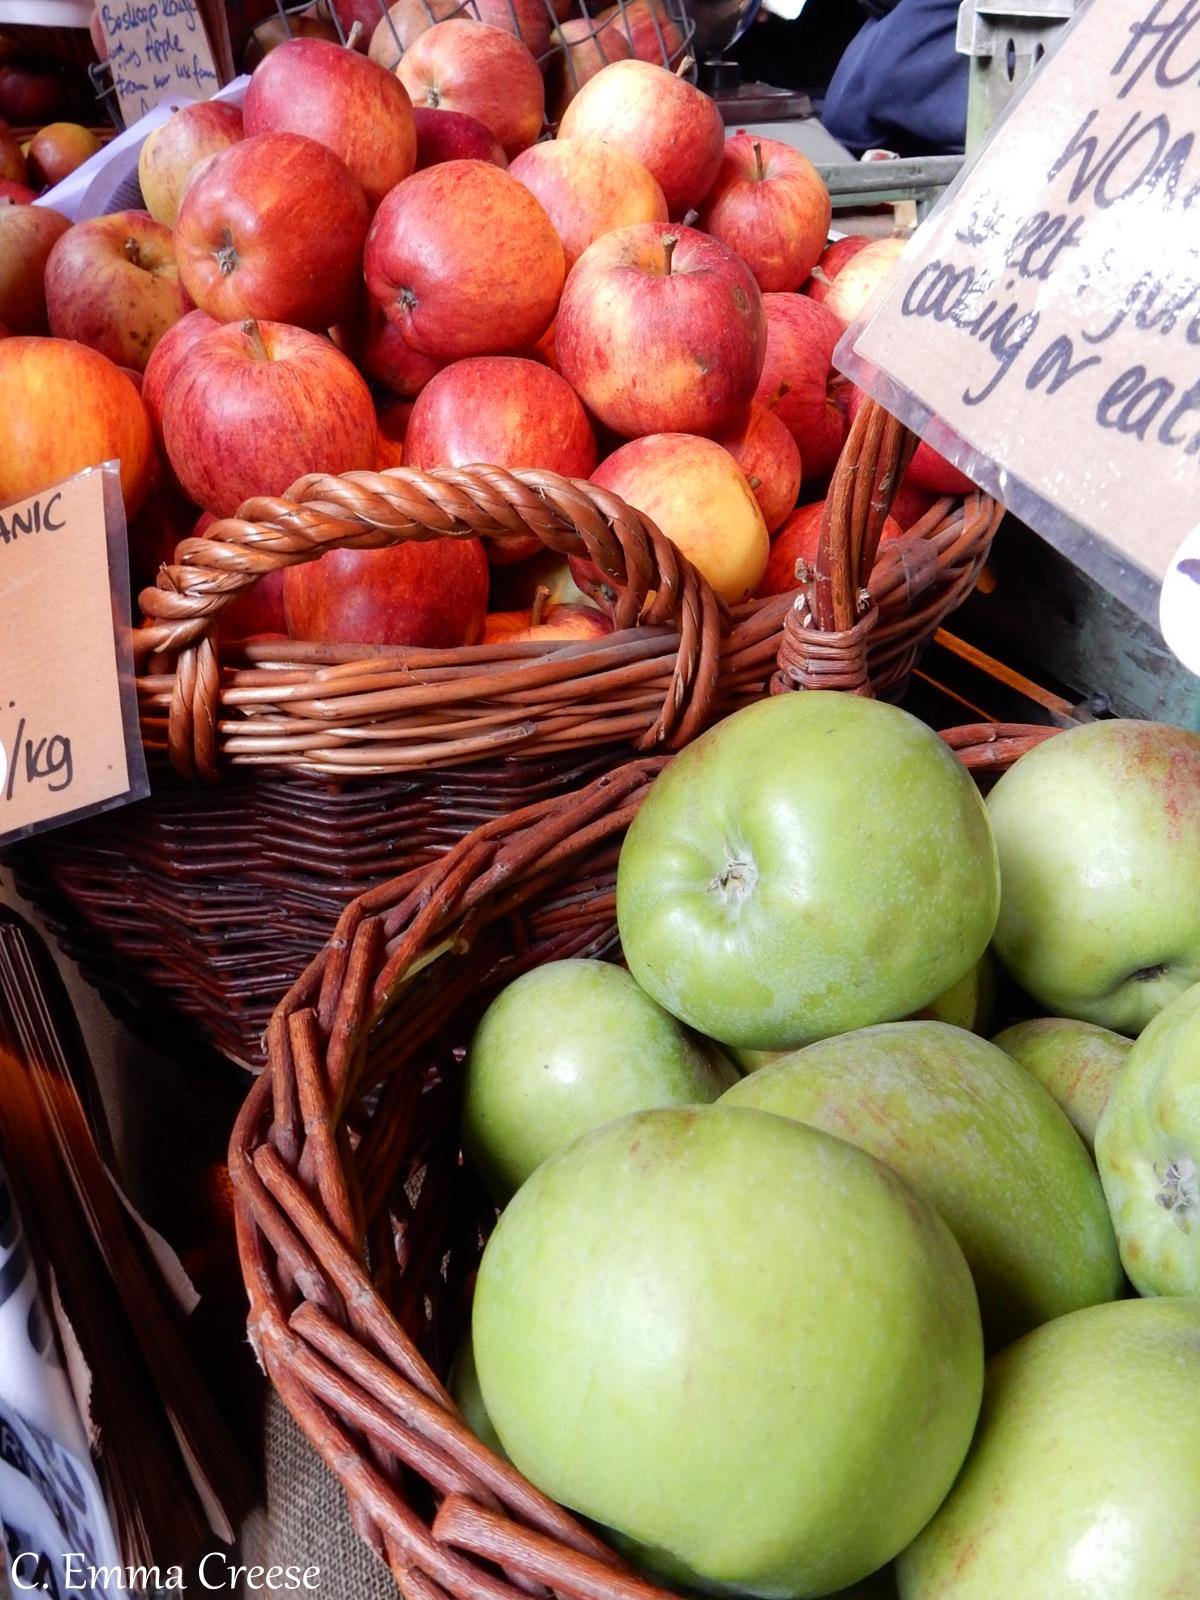 Apple Day at Borough Market